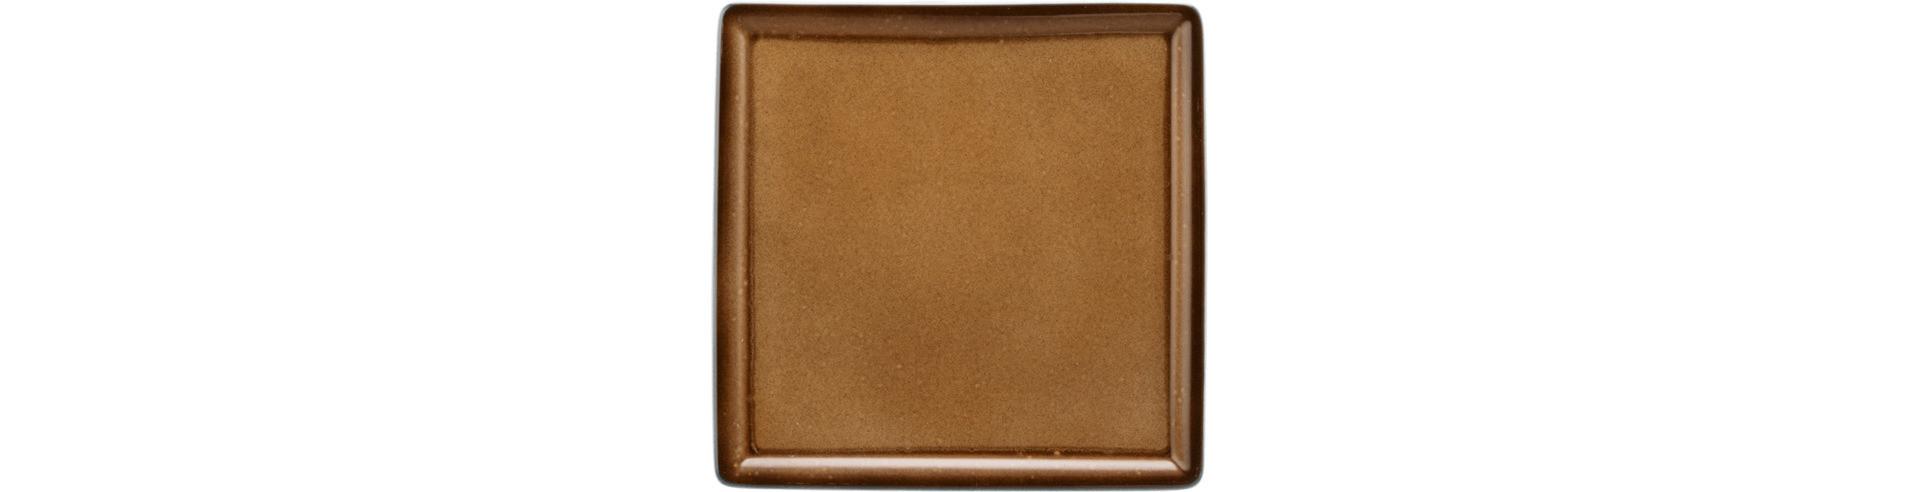 Fantastic, Platte quadratisch 160 x 160 mm caramel